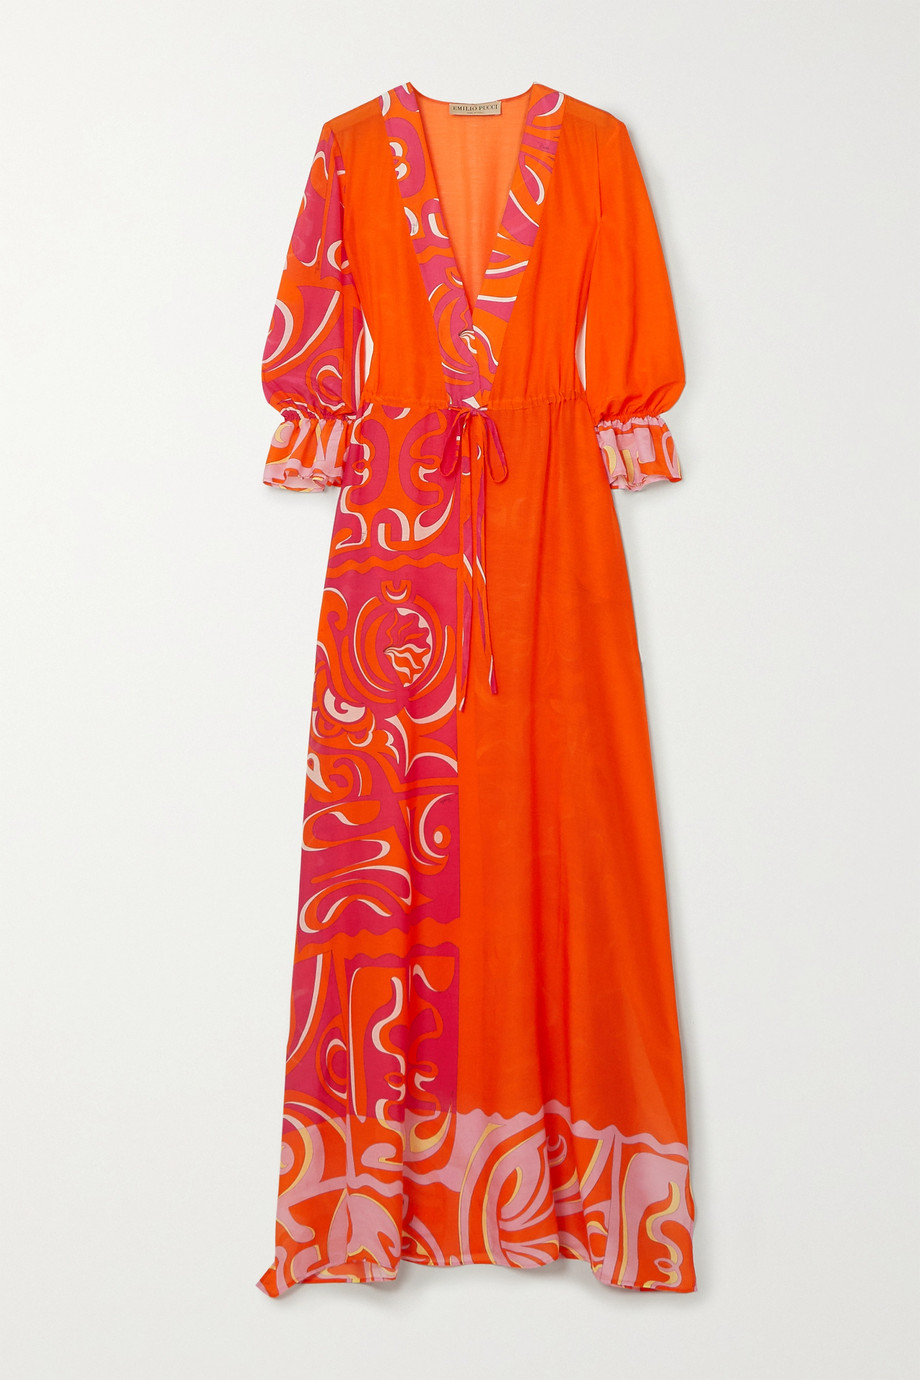 Emilio Pucci | Printed cotton and silk-blend chiffon maxi dress | NET-A-PORTER.COM